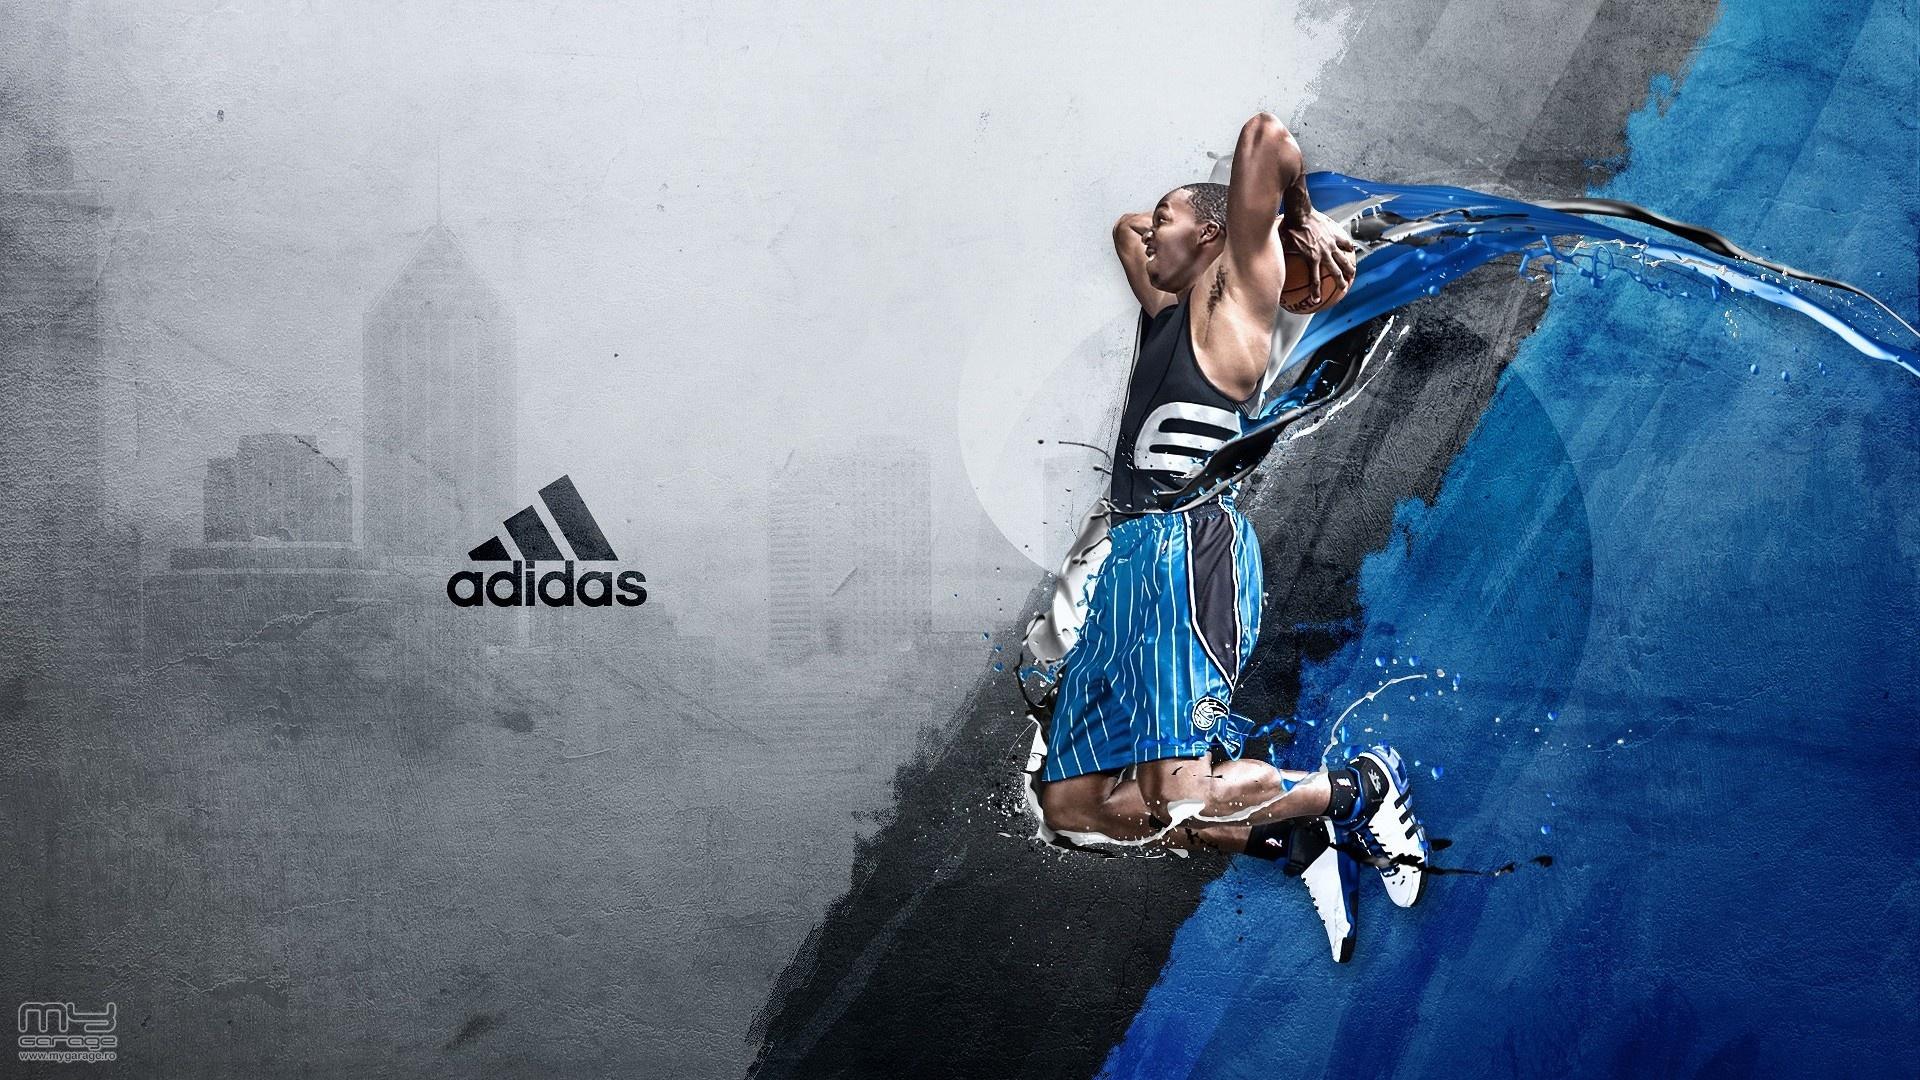 adidas sports